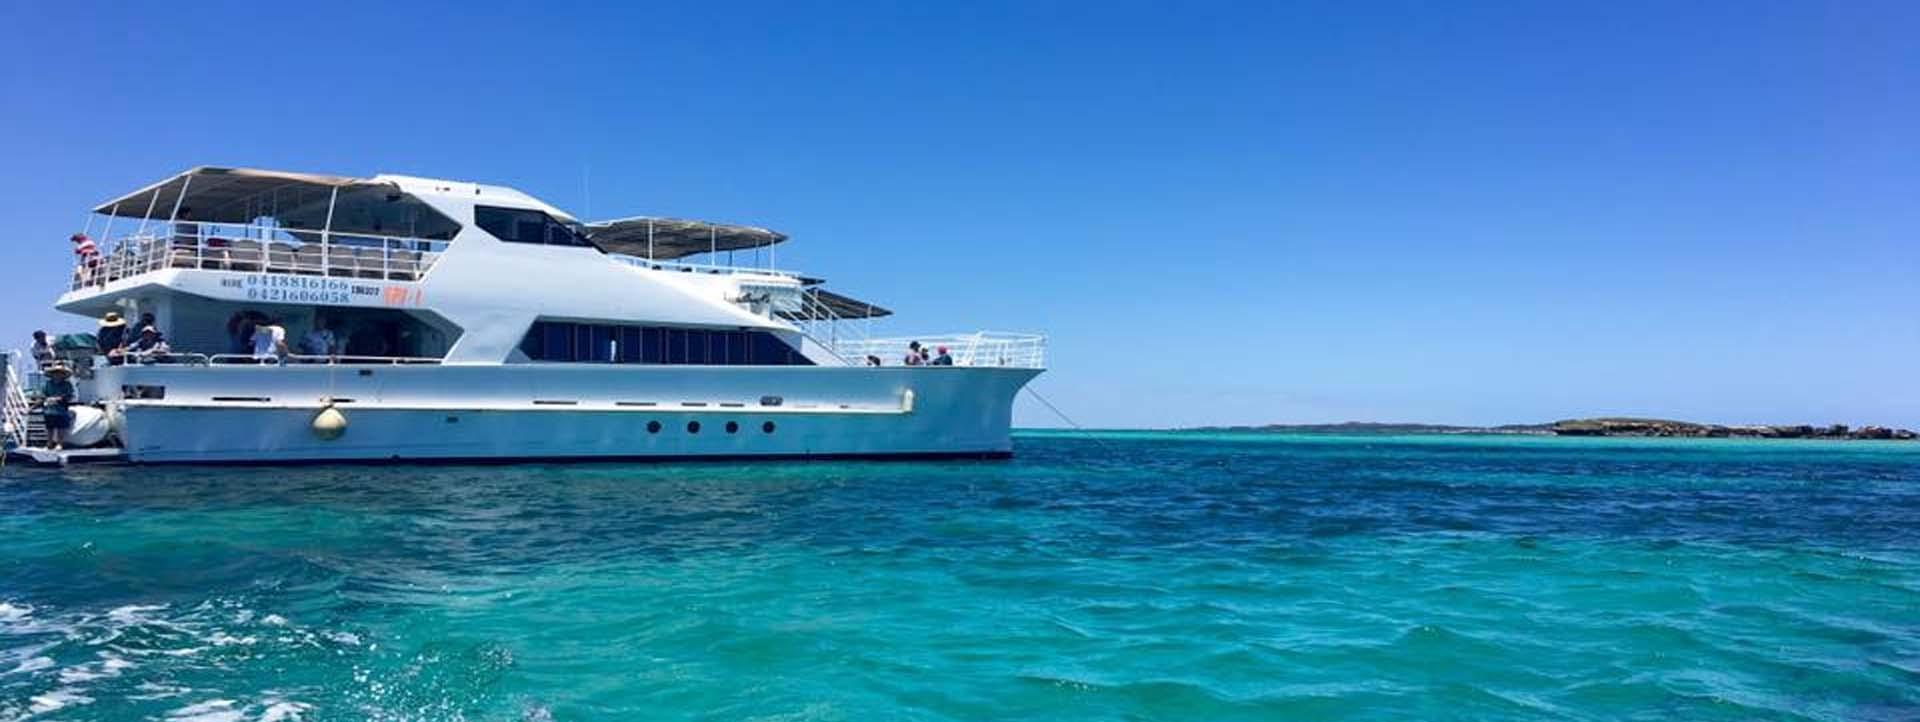 SPIRIT OF LOVE boat profile side